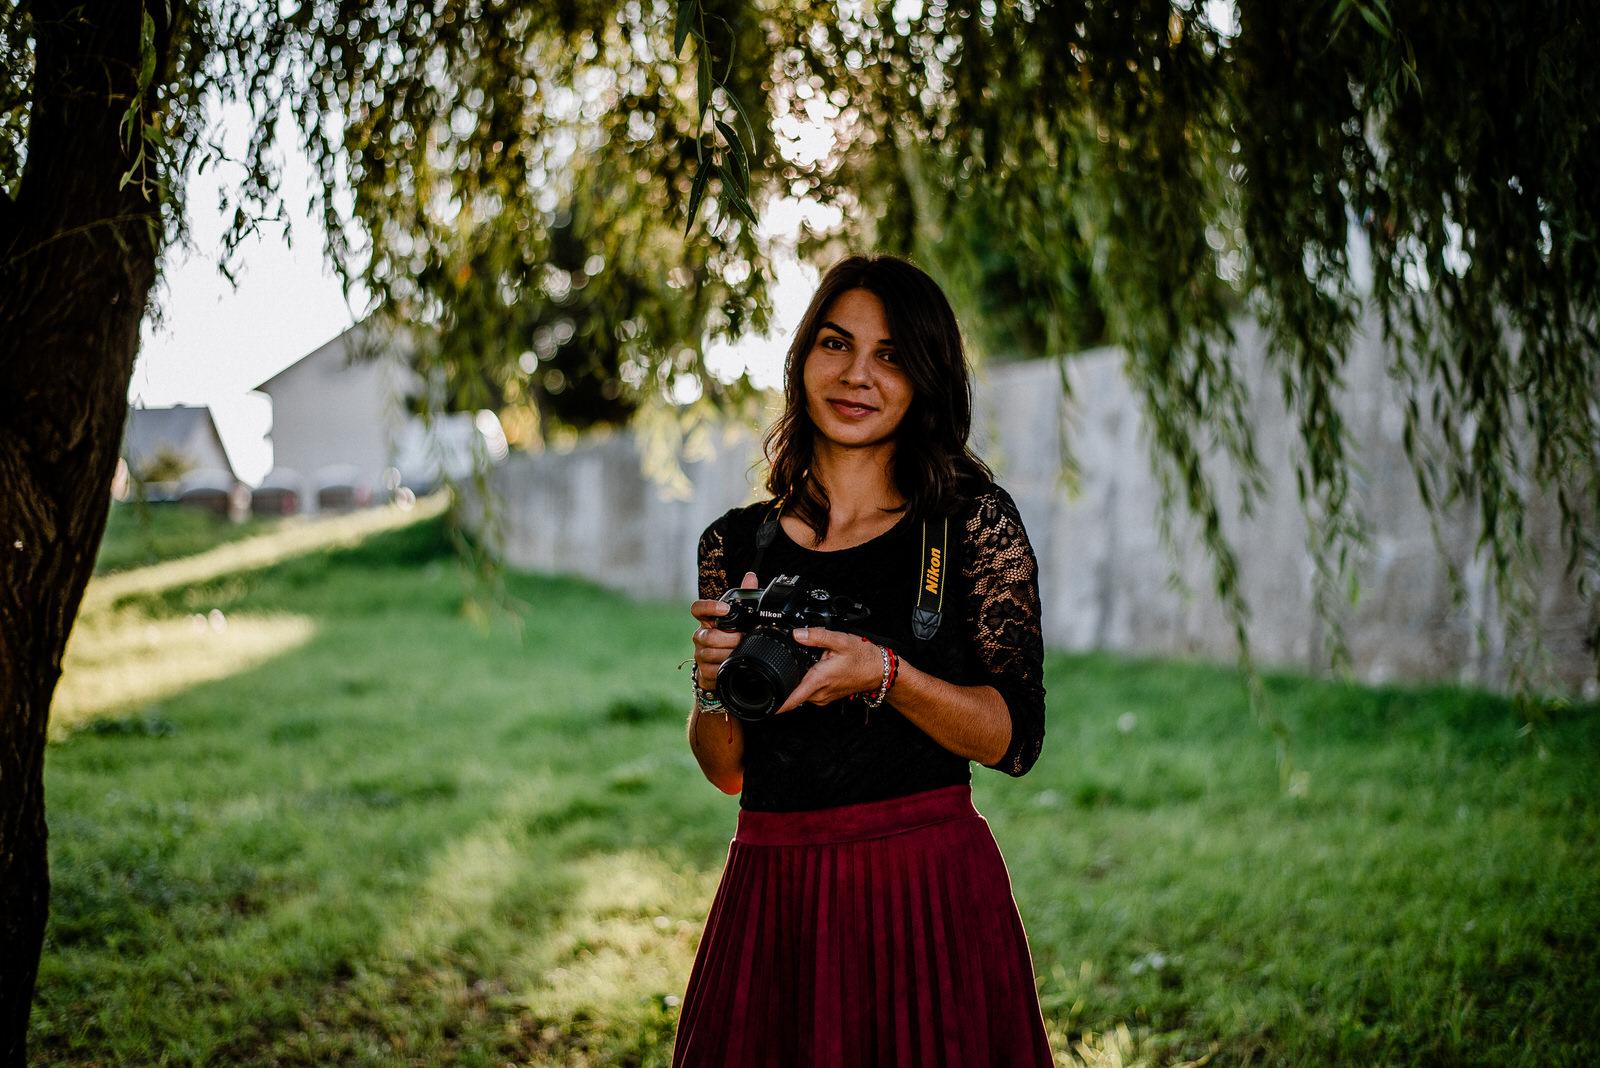 likaclub_intervju-tomislava-i-marija-maras_gospić_2019-5